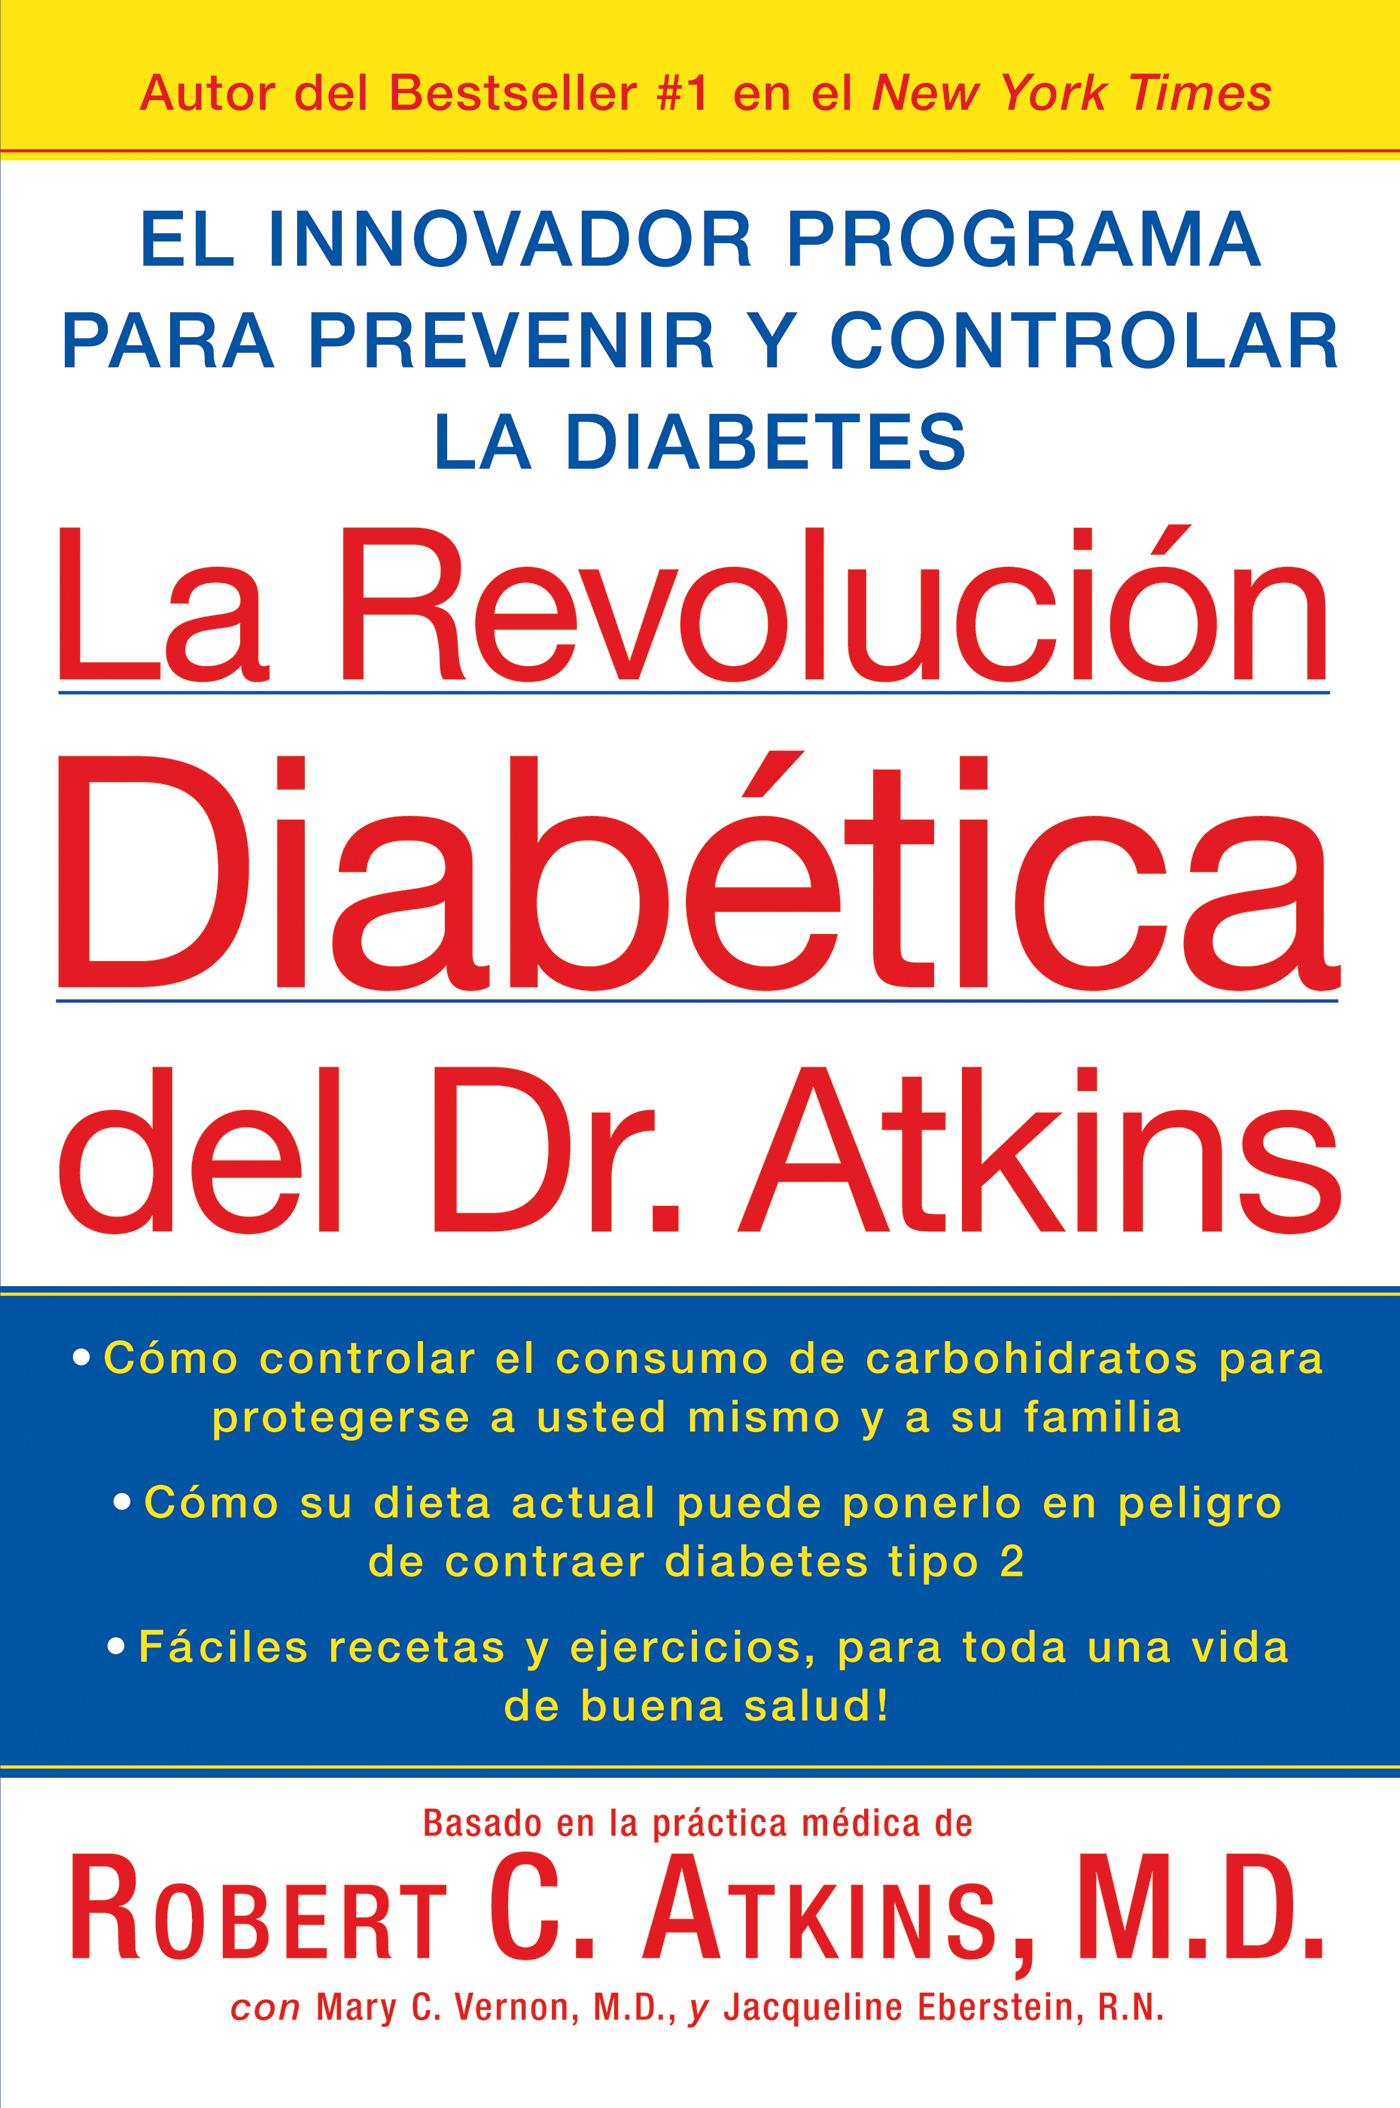 controlar la diabetes 2 con dieta